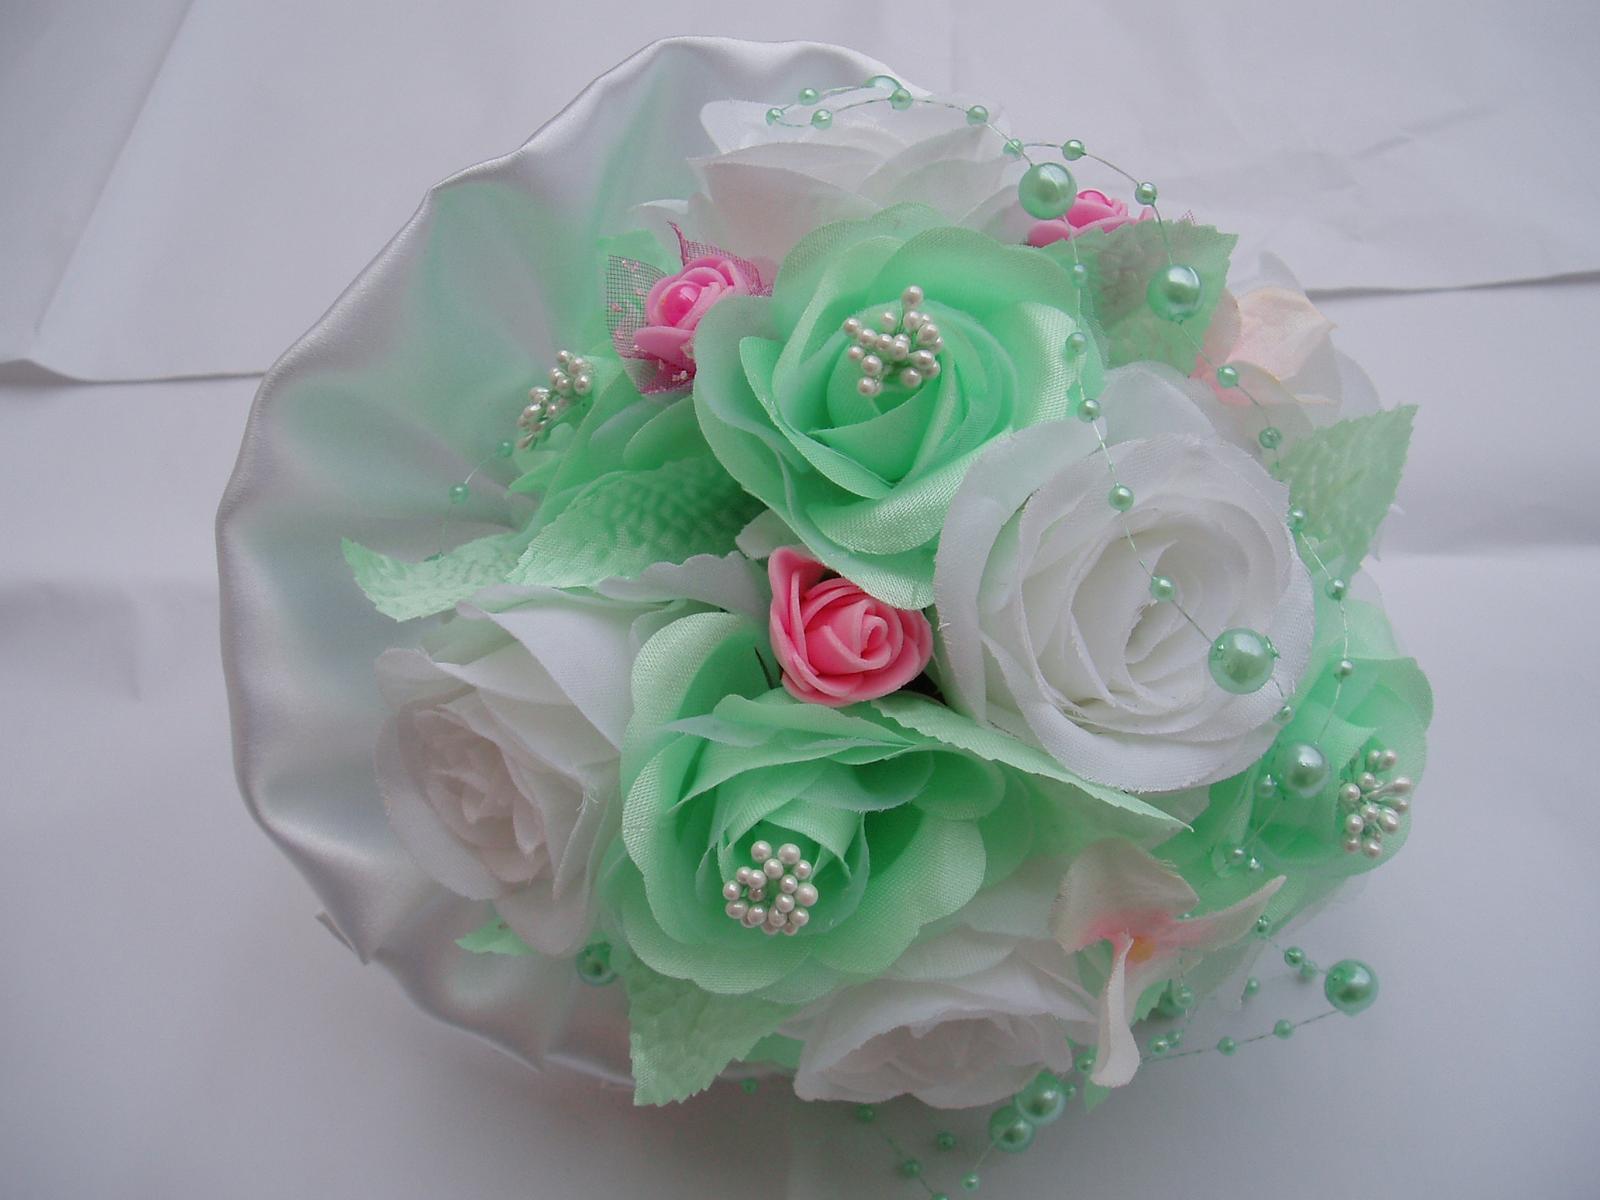 kytička mint-růžová-bílá - Obrázek č. 1